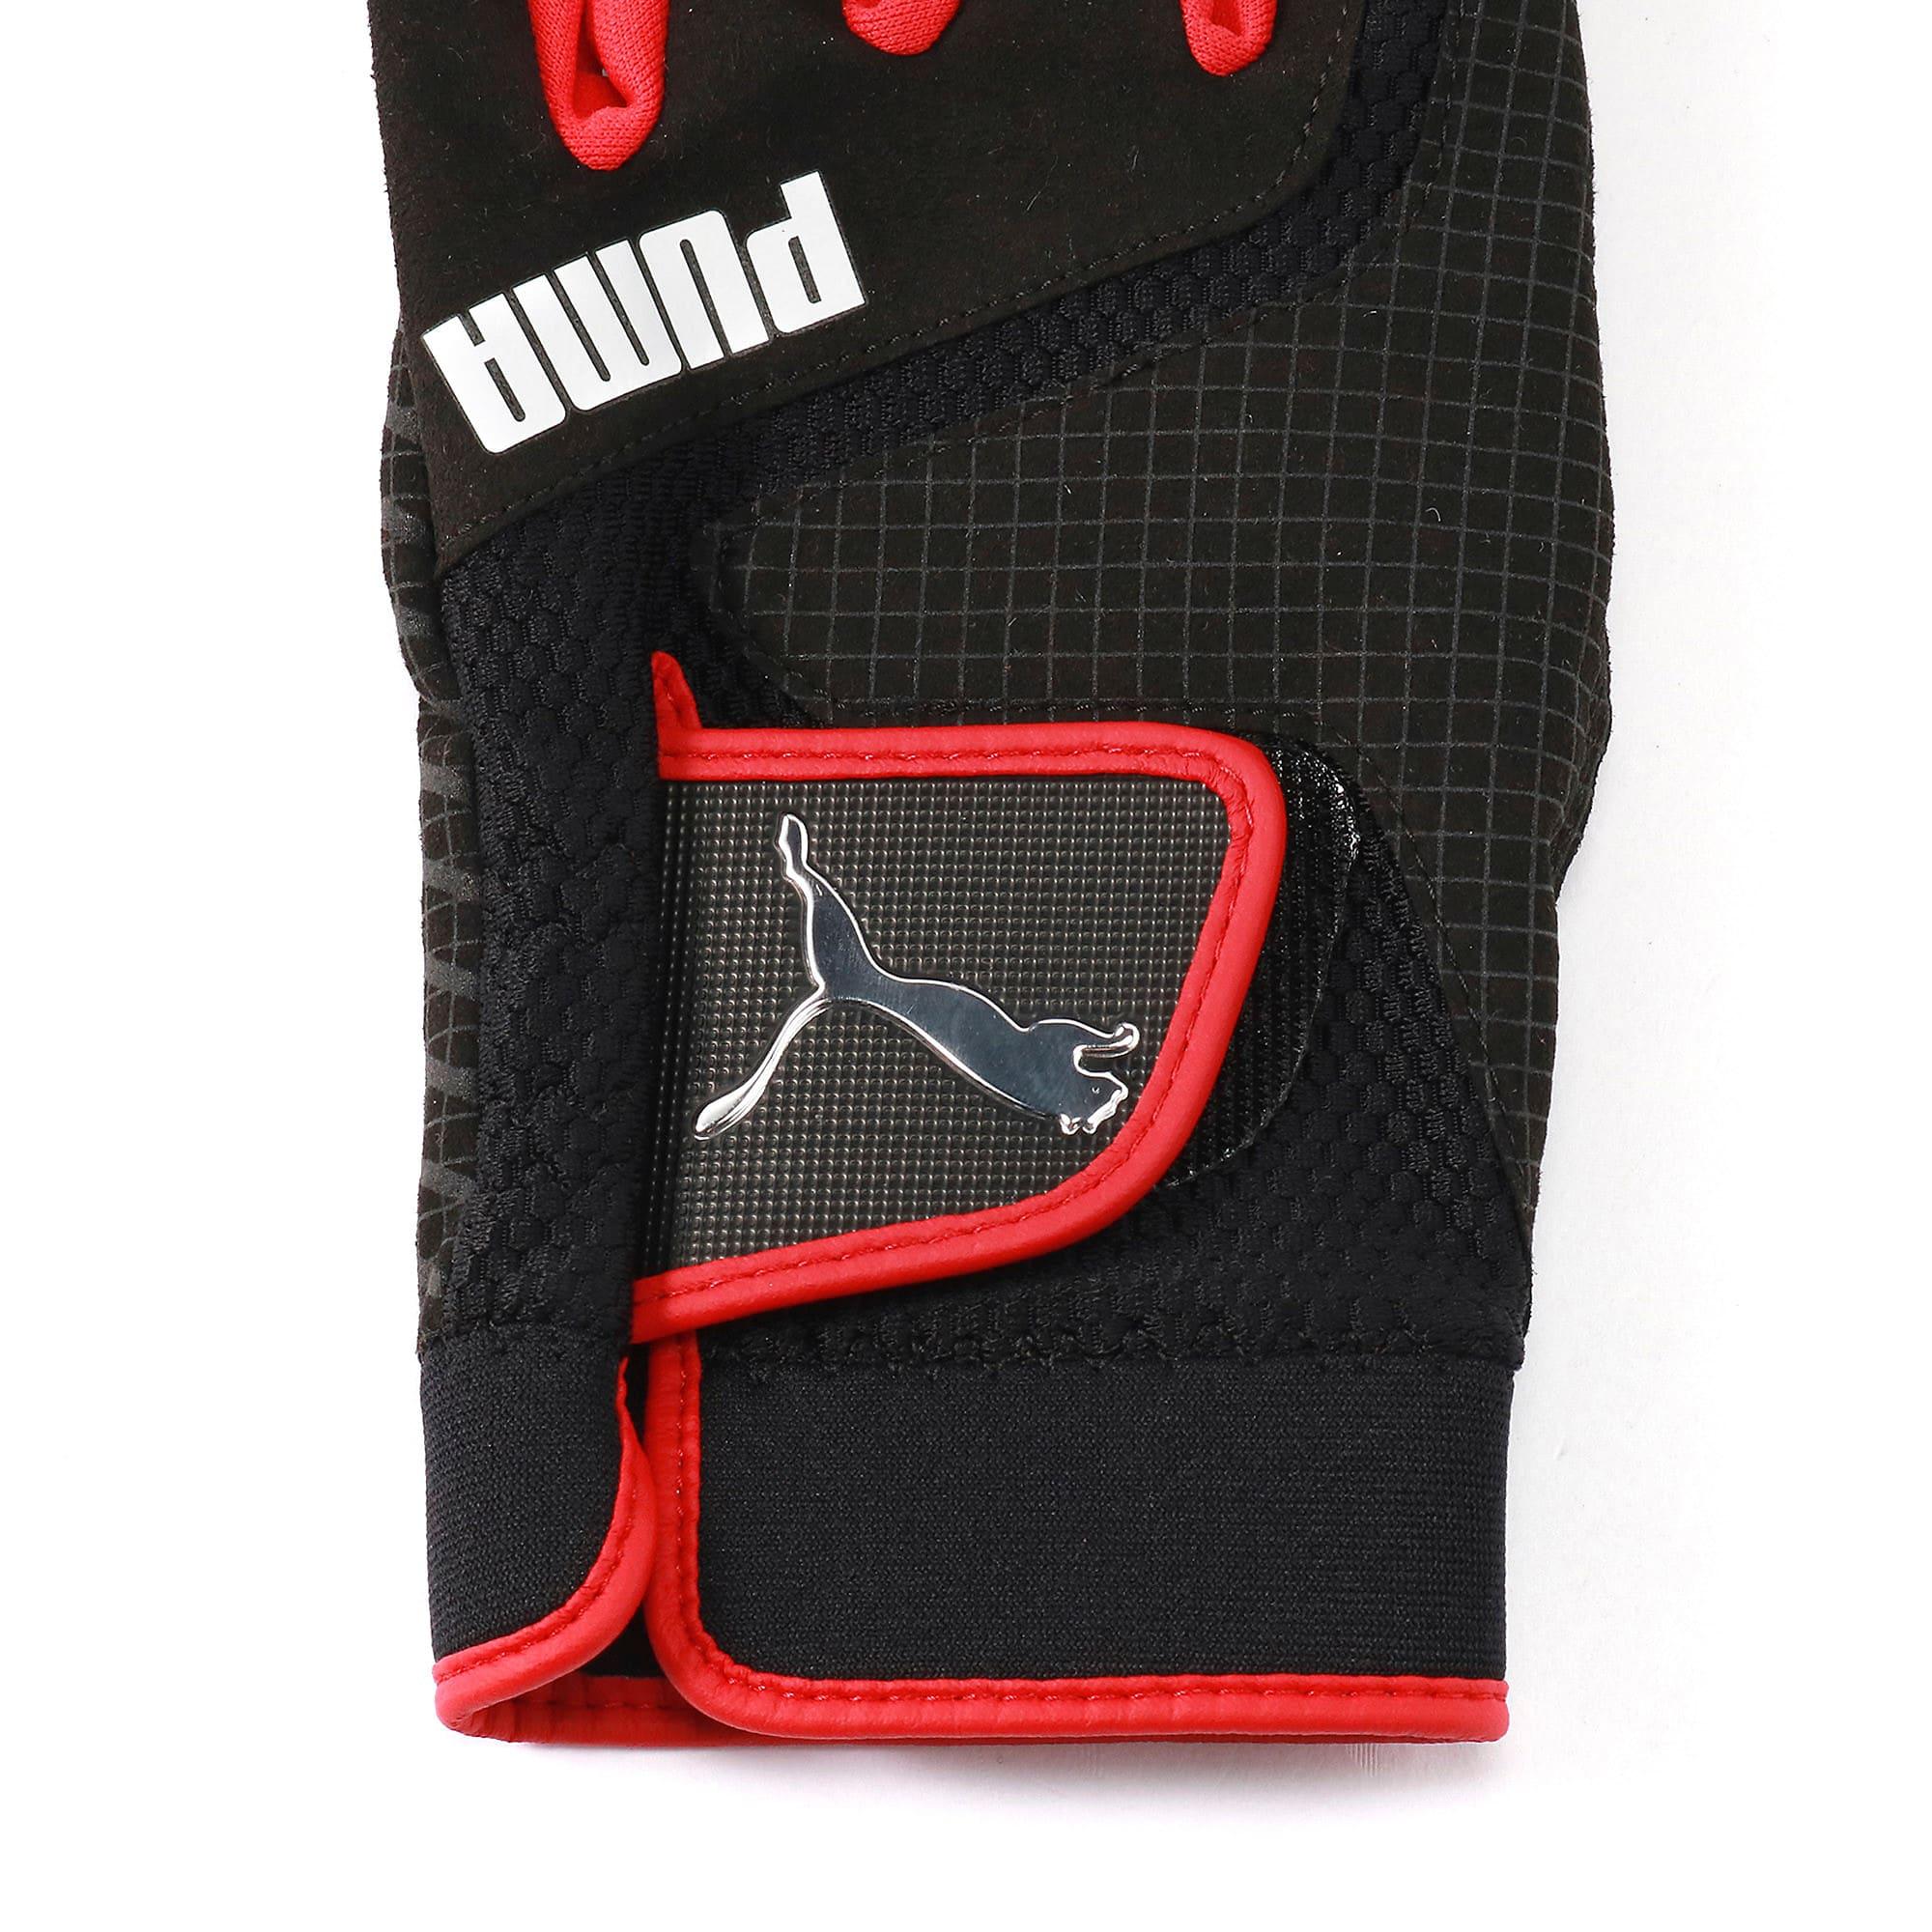 Thumbnail 5 of ゴルフ 3D ウィンター グローブ, Puma Black / High Risk Red, medium-JPN